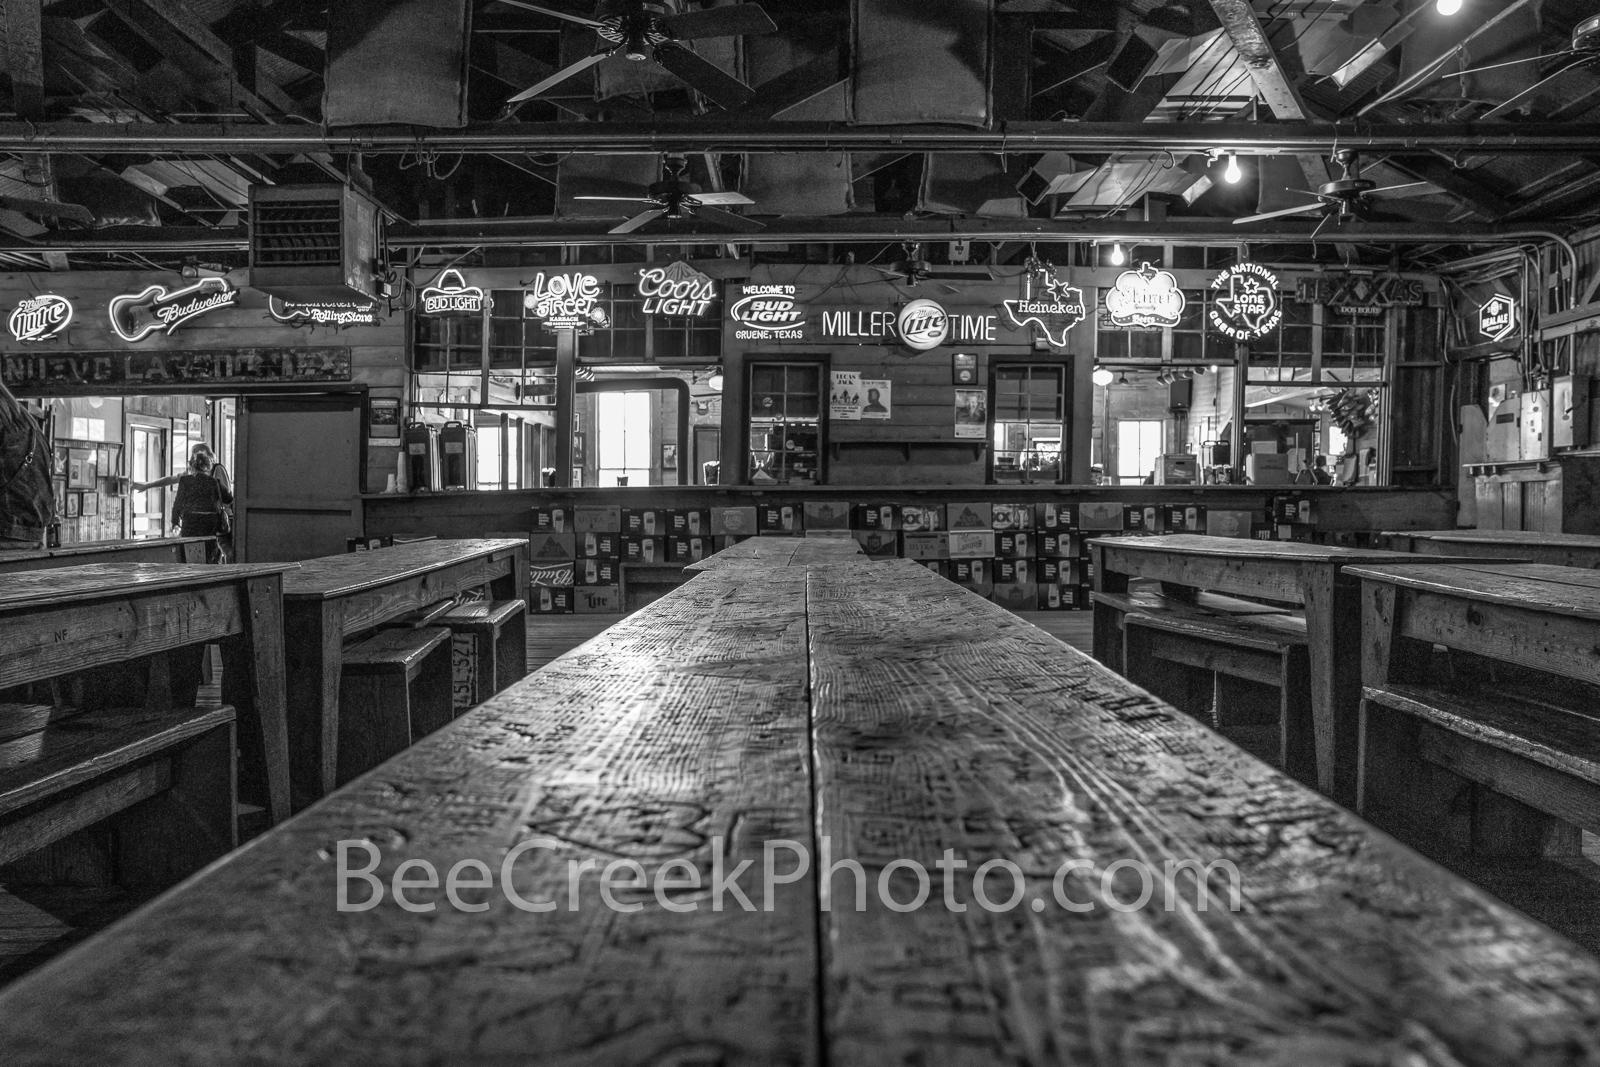 gruene hall, gruene saloon, gruene texas, dance hall, saloon, town, community, earnest gruene, german, german town, texas, texas hill country, visit, national register of historic places, german bar, , photo